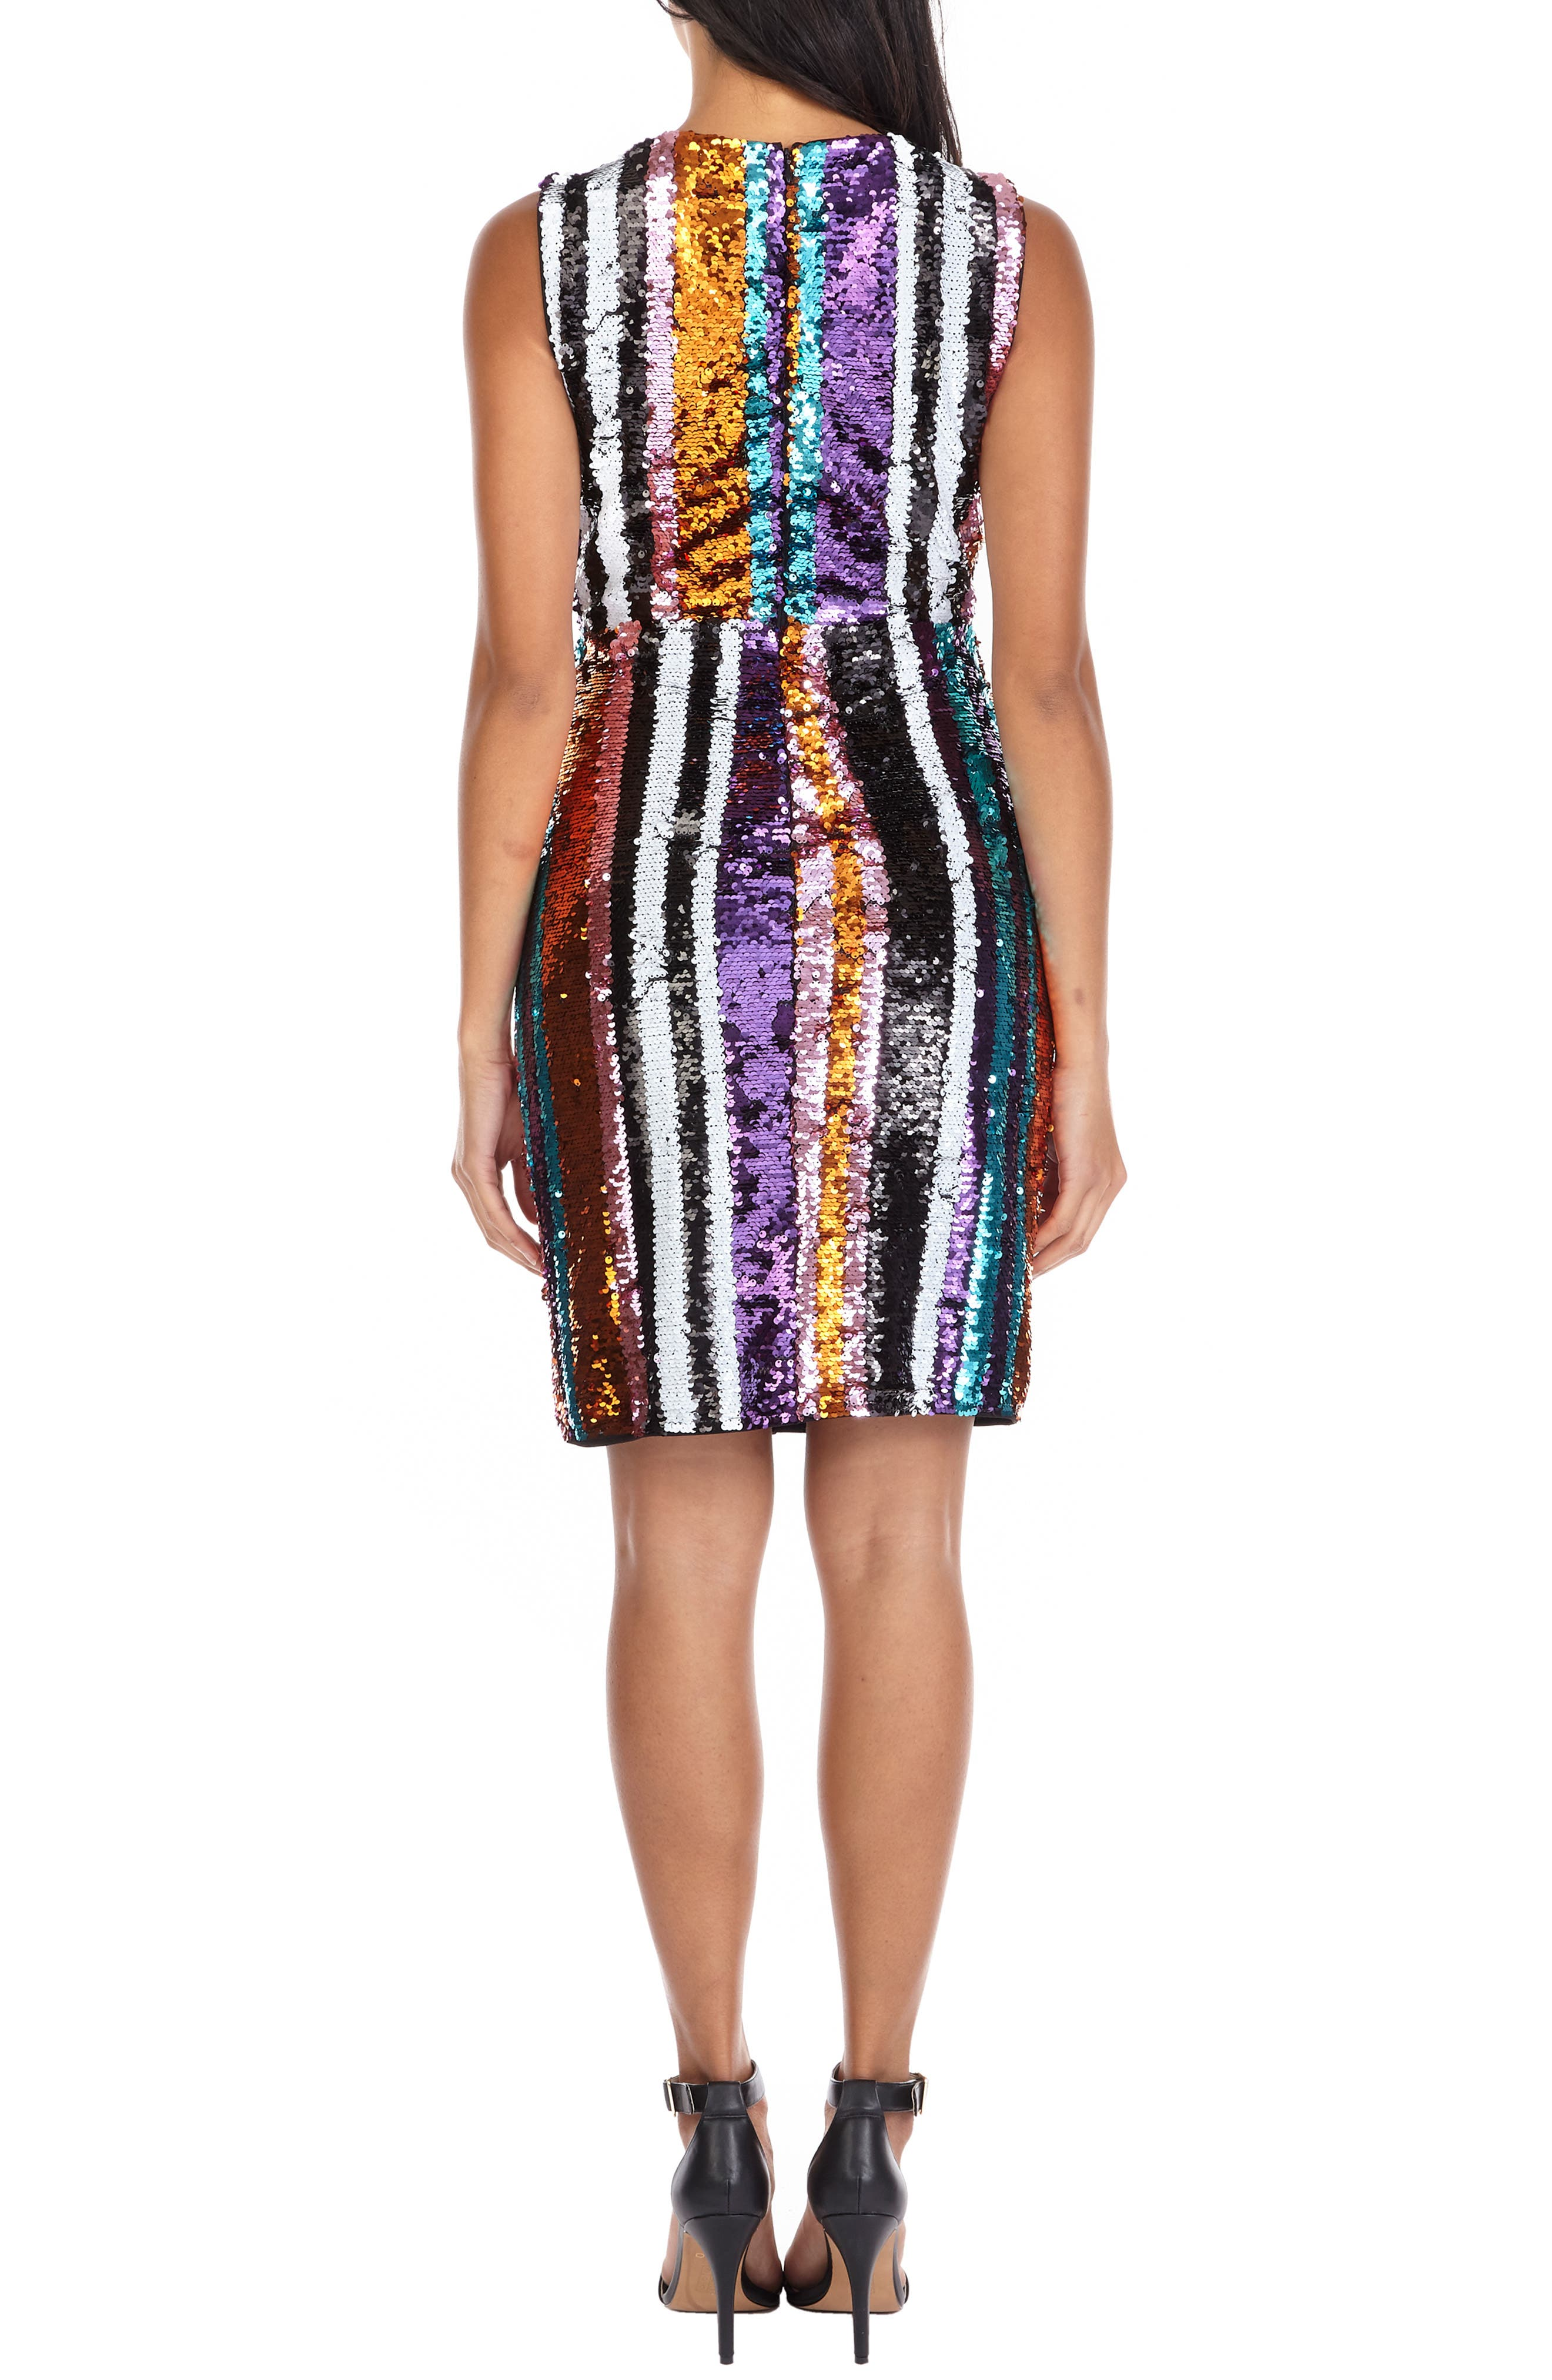 Sarah Rainbow Sequin Stripe Cocktail Sheath,                             Alternate thumbnail 2, color,                             MULTI PURPLE